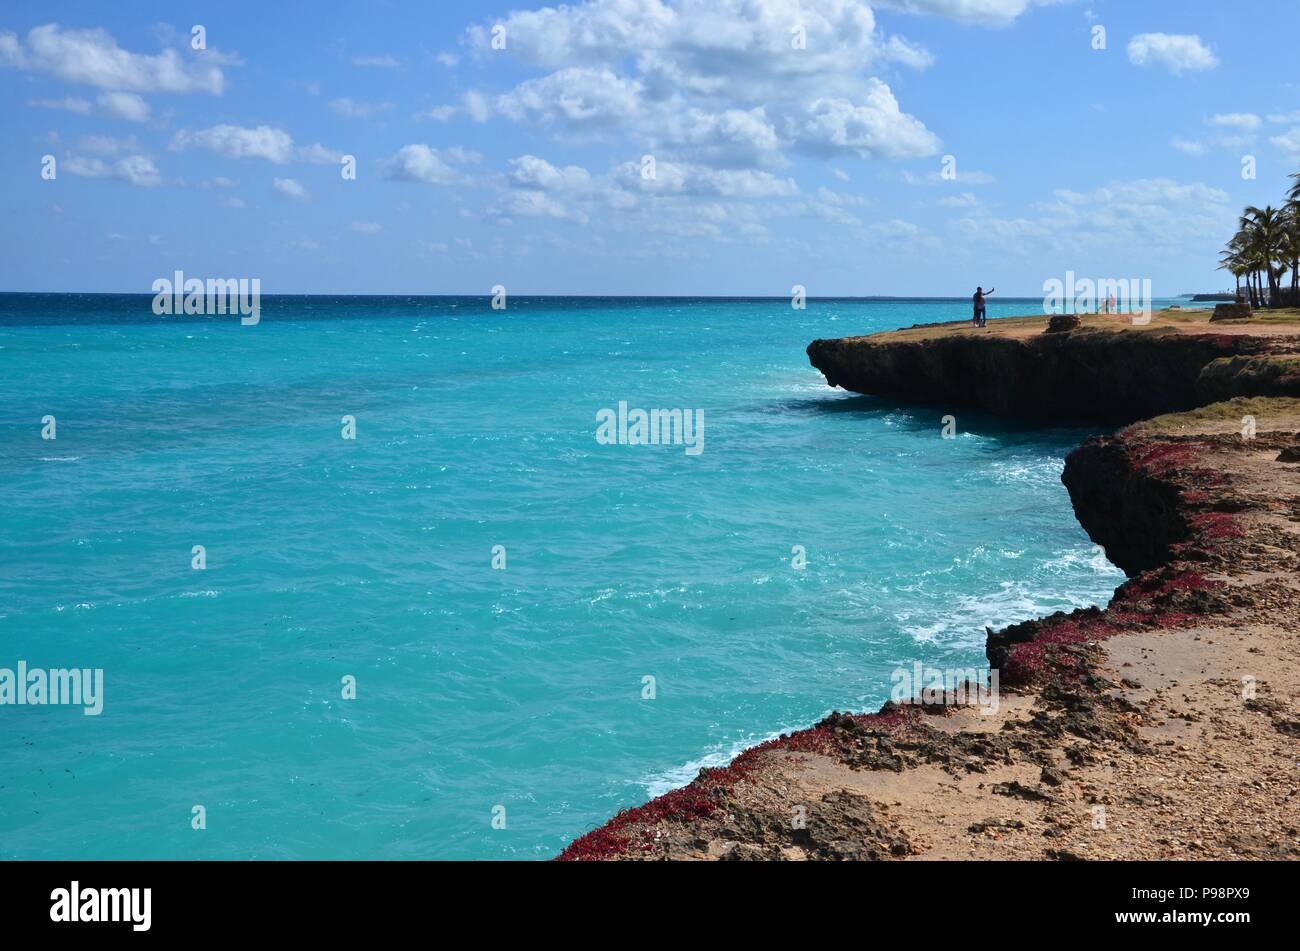 Rocky coast of Varadero Cuba, Xanadu Mansion, caribbean sea, turquoise water, vacation, blue sky, sunny, horizon, beautiful, palm trees, coconuts - Stock Image